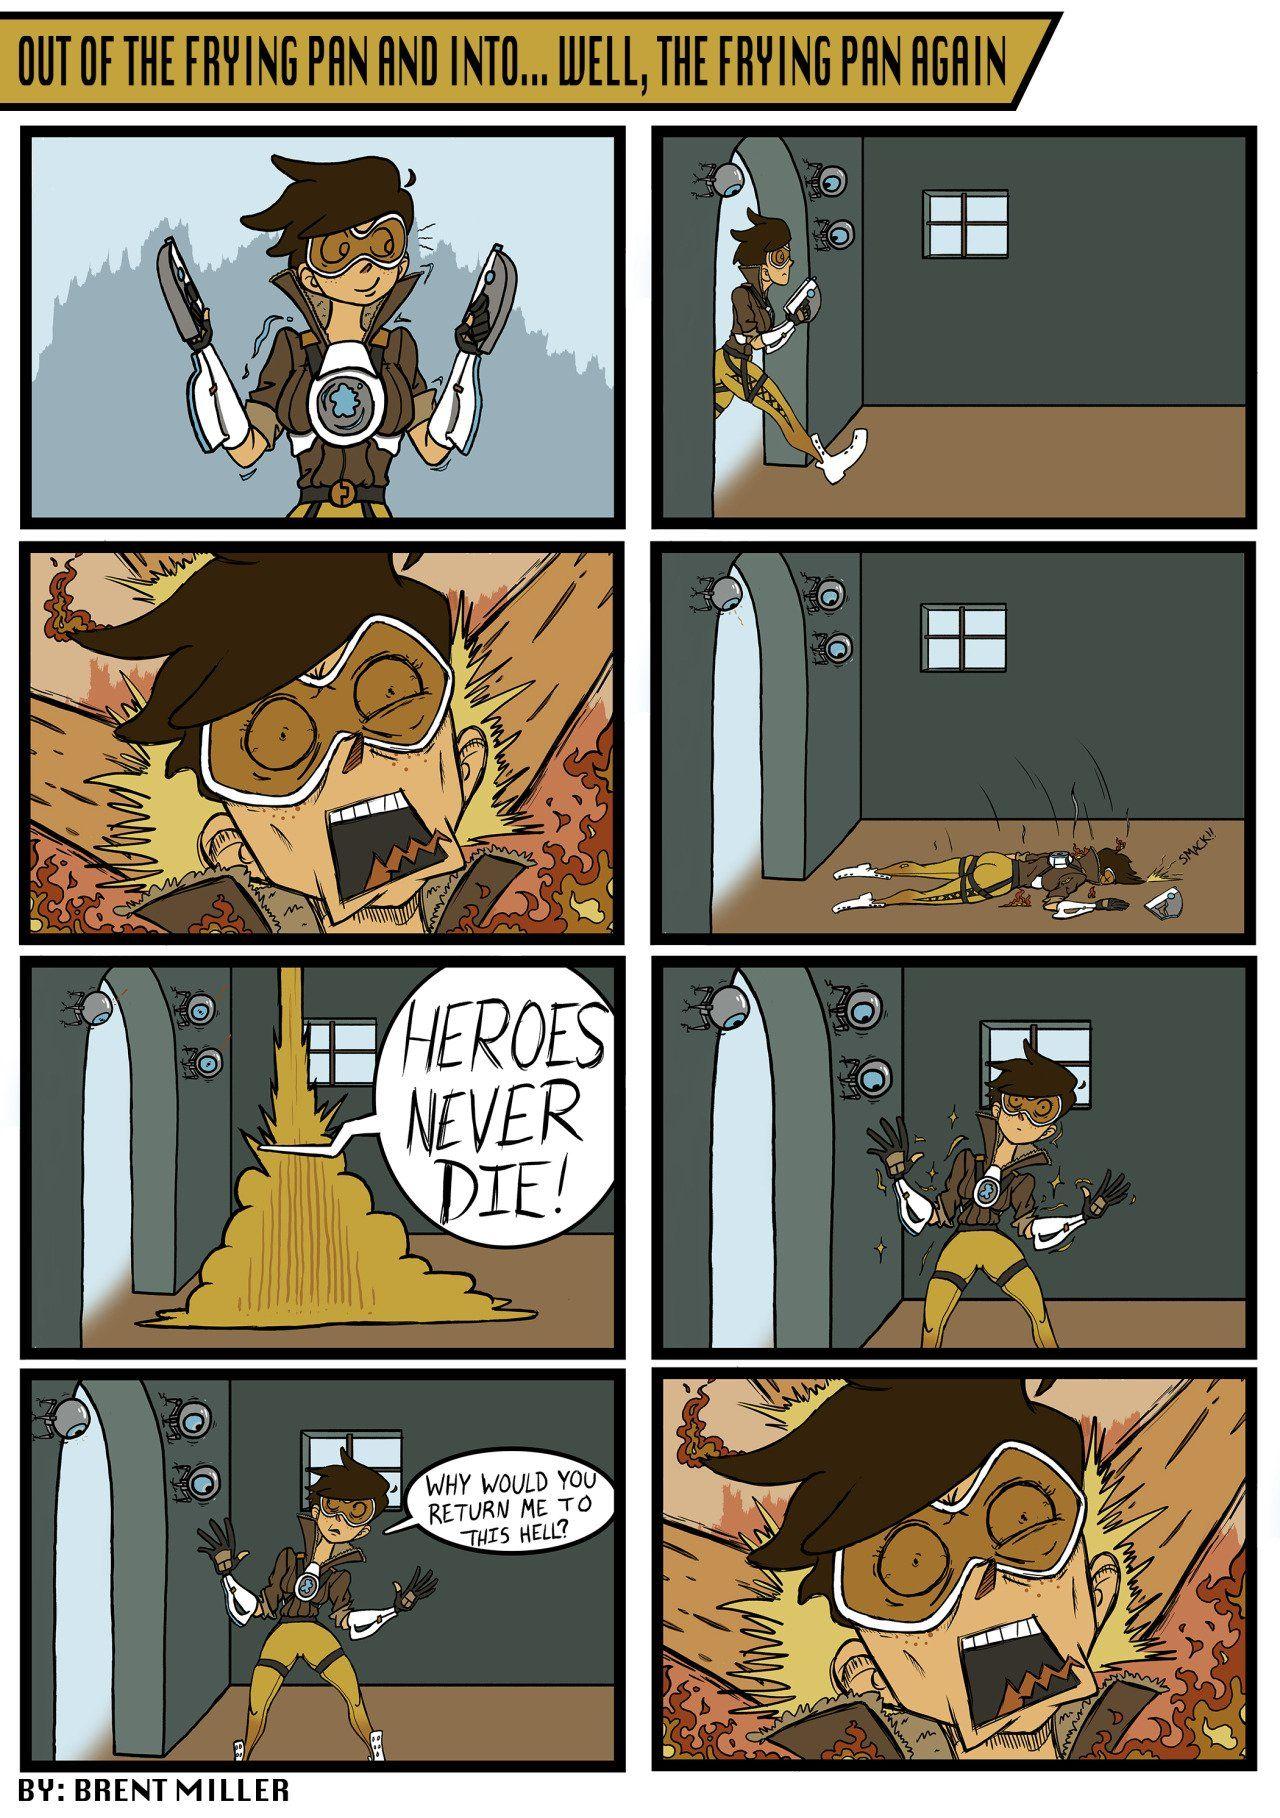 Image of: Reflections Overwatch Fan Comics Pinterest Overwatch Fan Comics Overwatch Overwatch Overwatch Comic